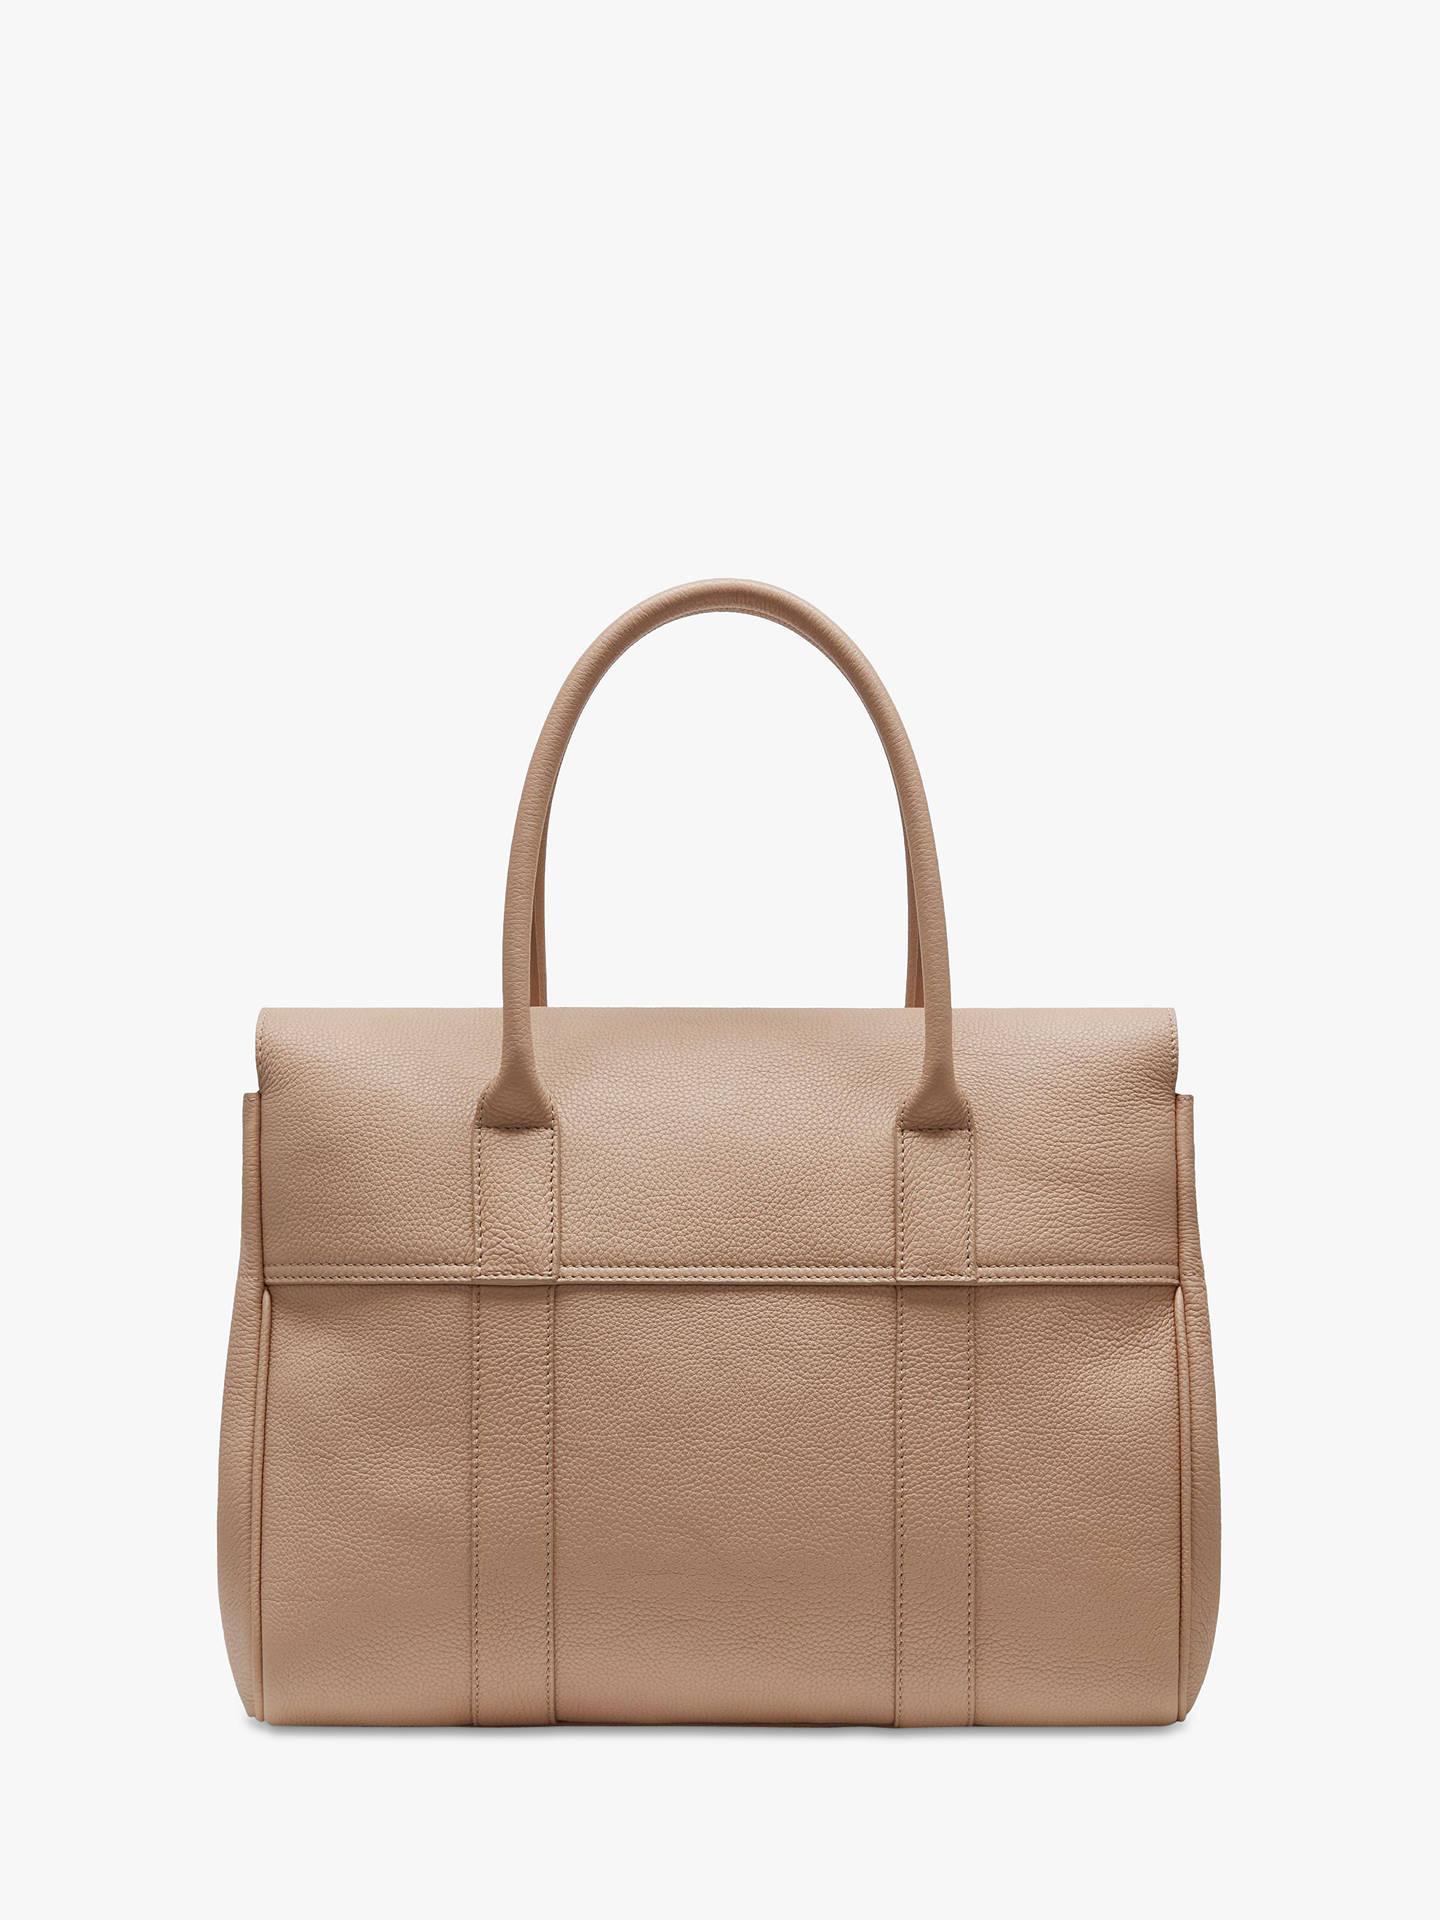 88449ba9c1 ... Buy Mulberry Bayswater Heritage Small Classic Grain Leather Handbag